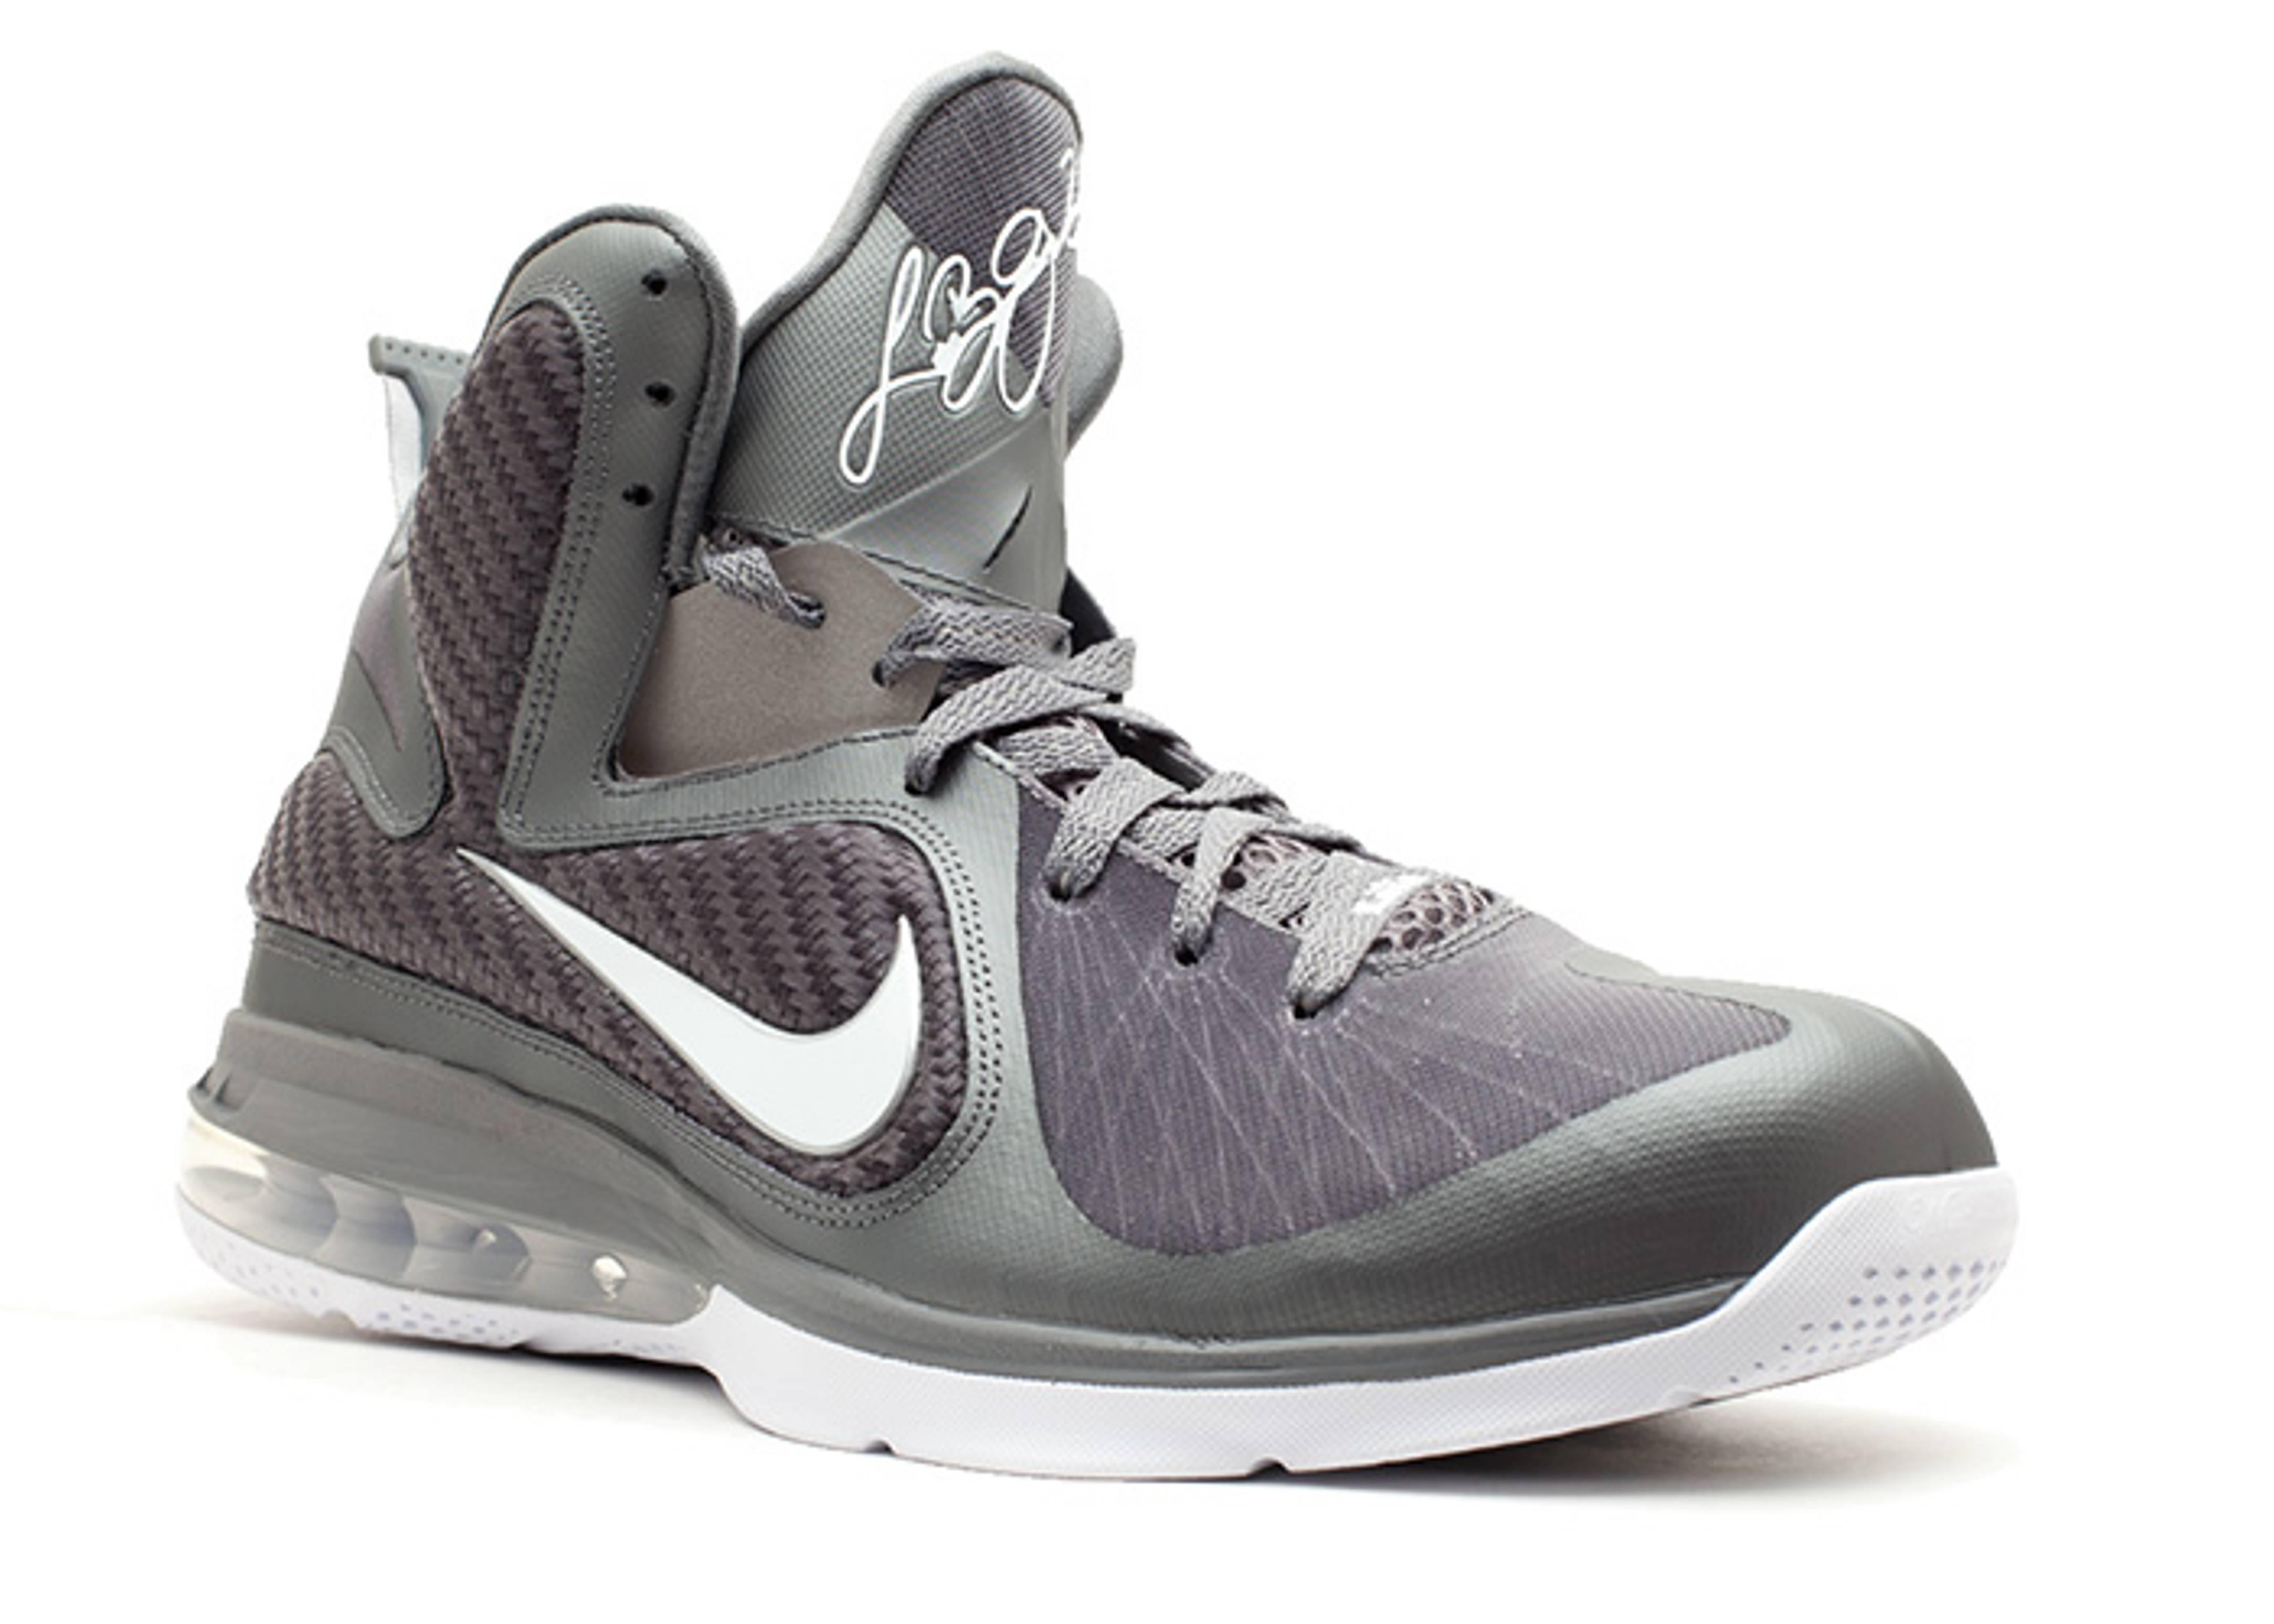 lebron 9 grey white shoes